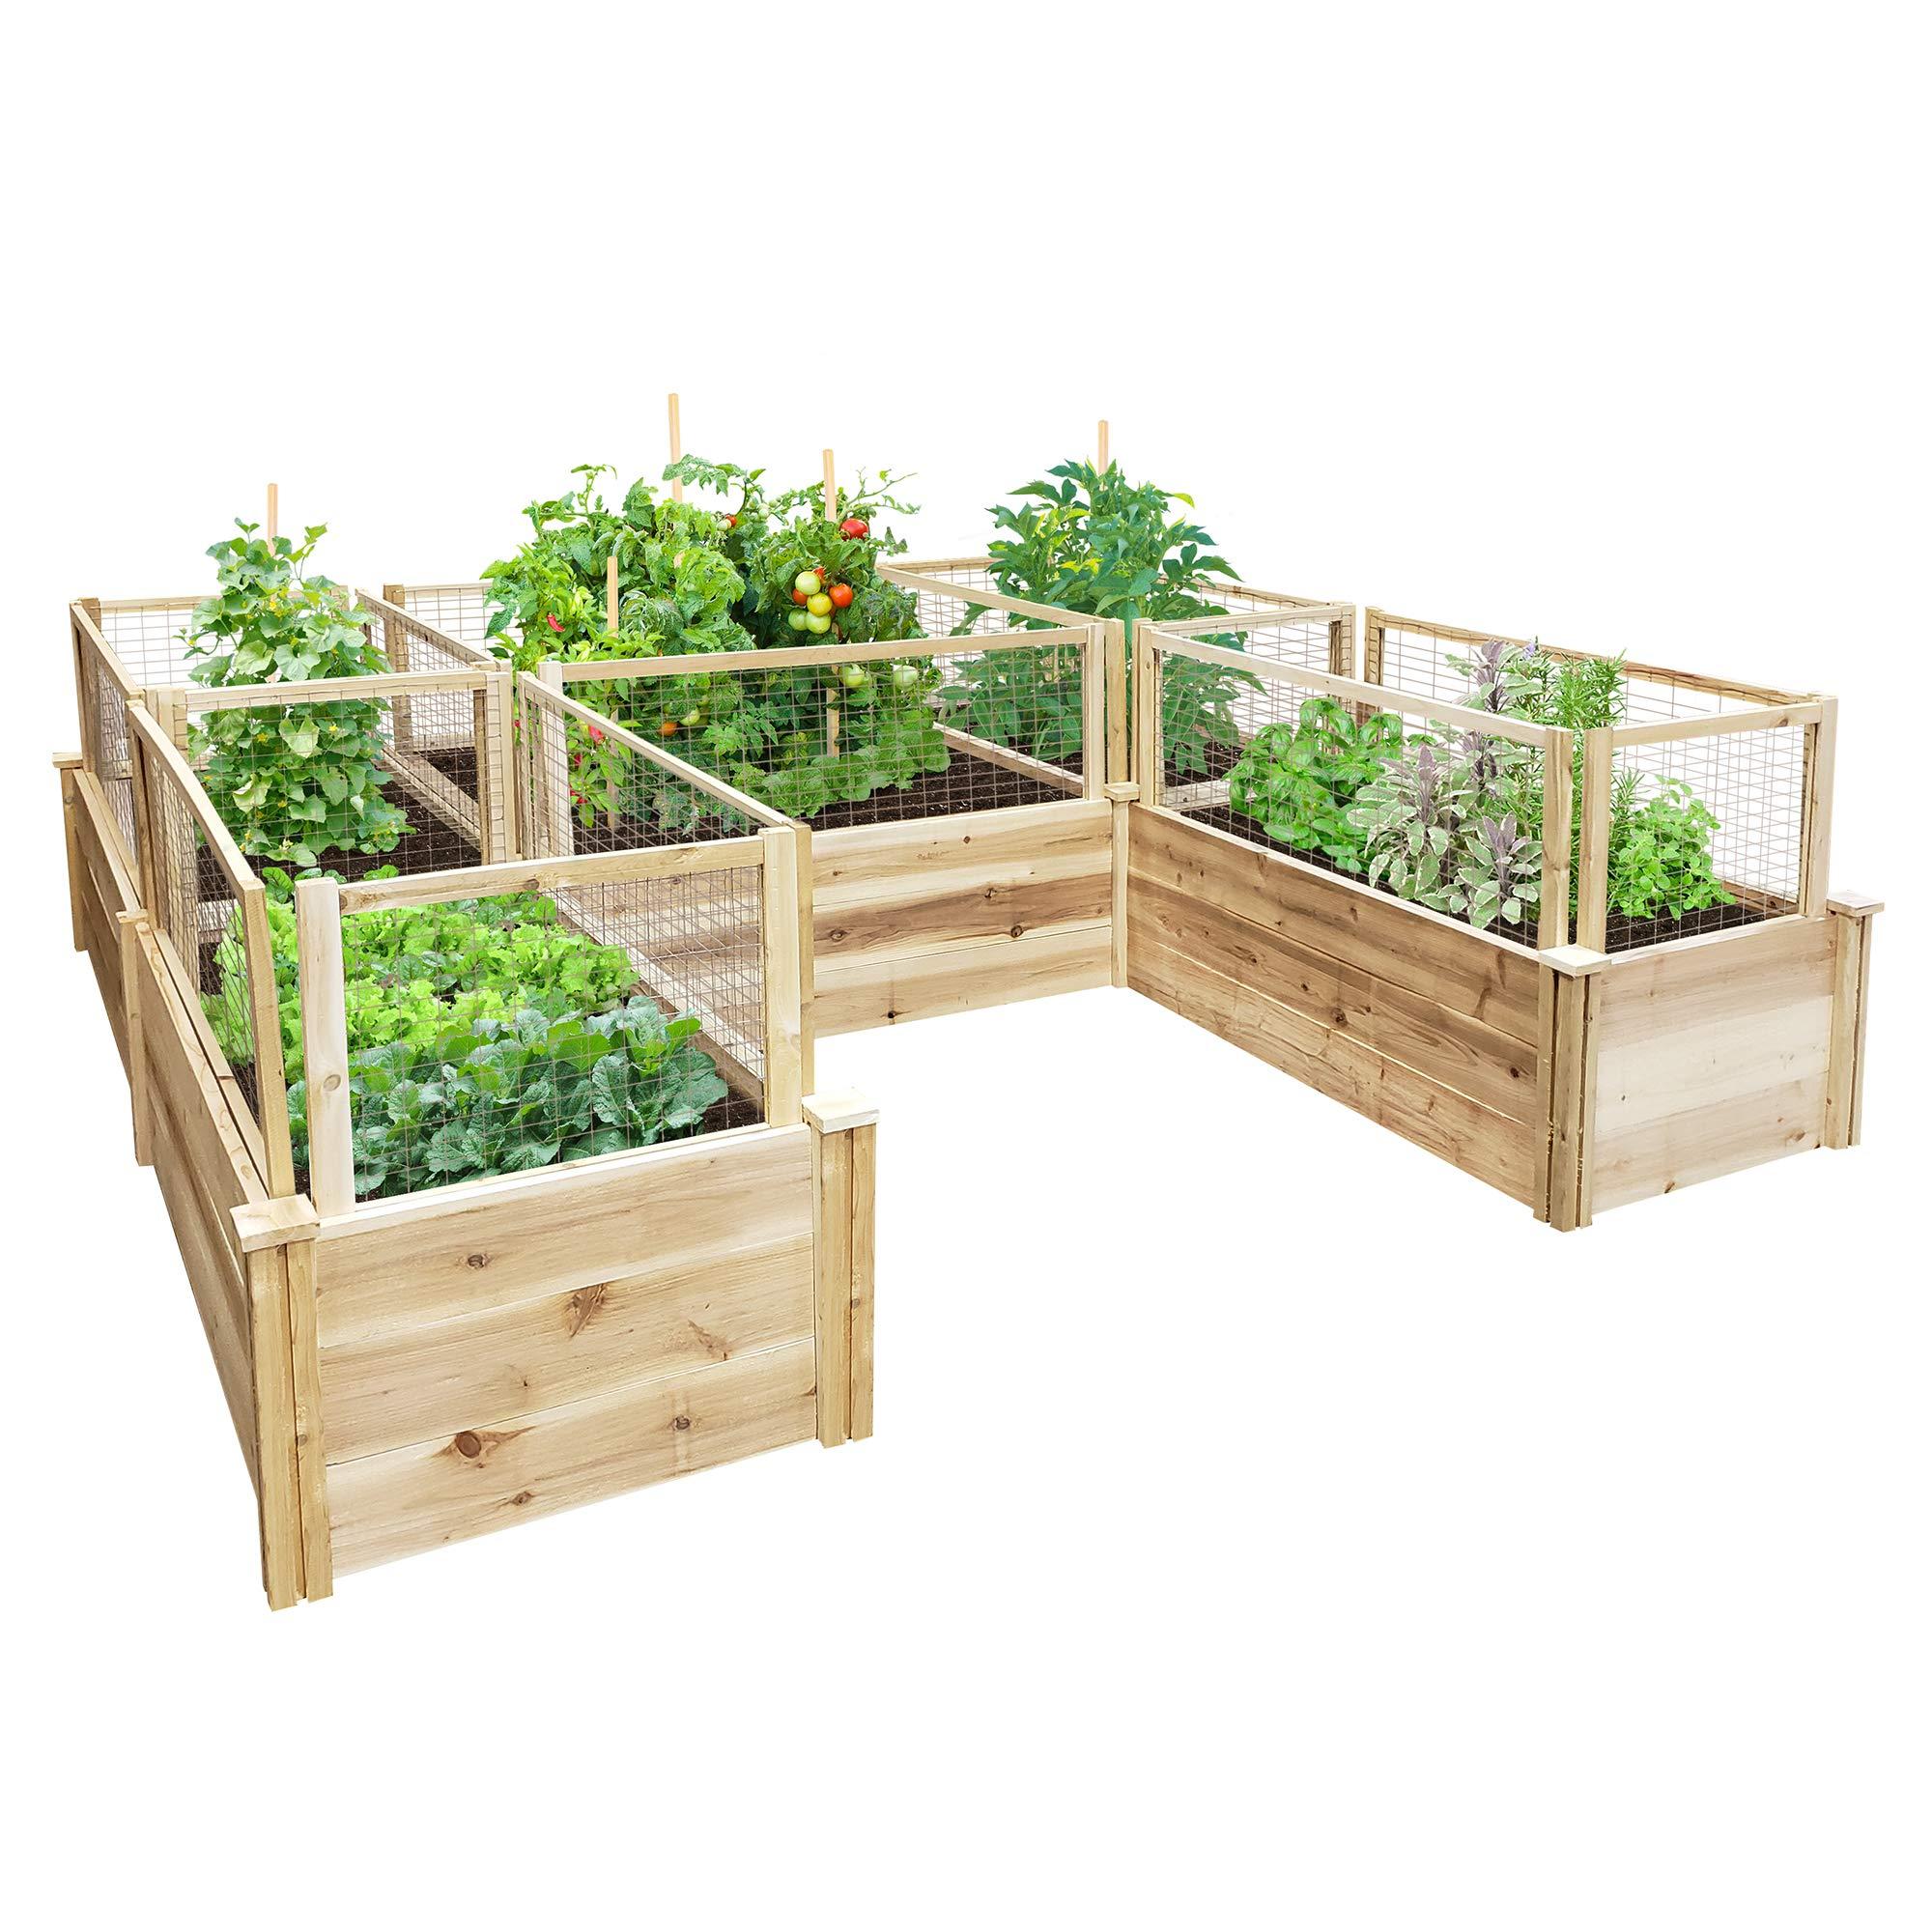 Greenes Fence Premium Cedar Raised Garden Bed 8 Ft X 12 Ft X